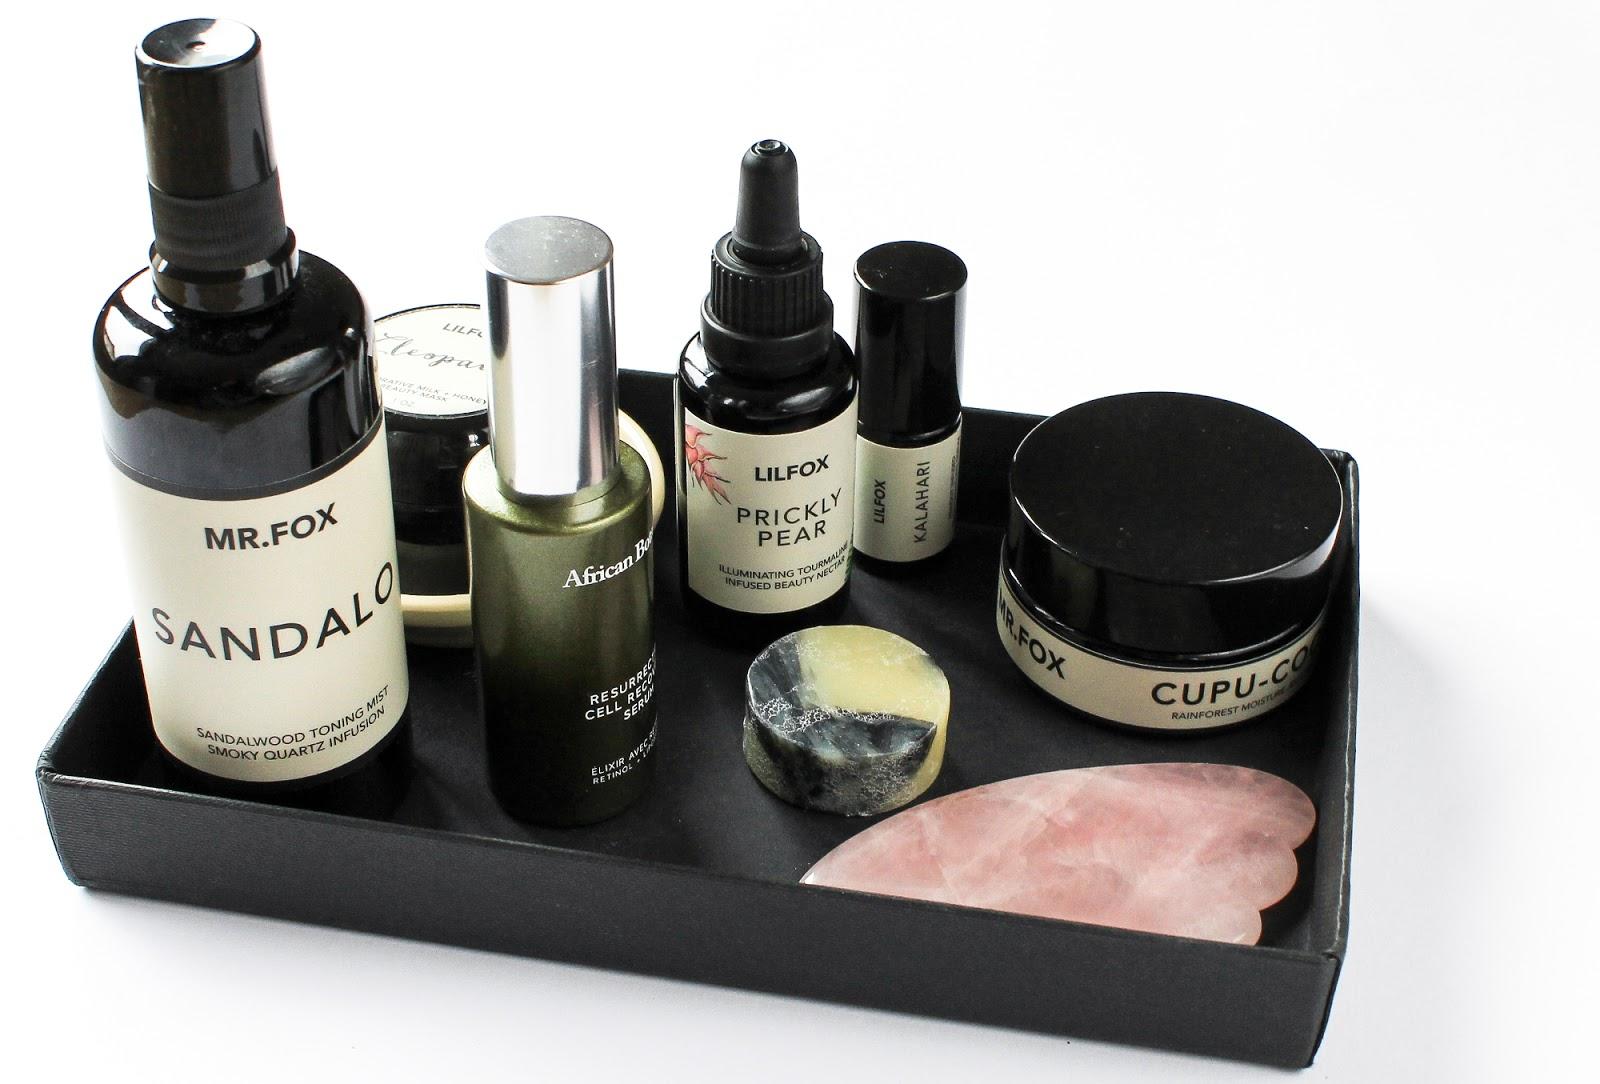 Evening Skincare Routine LILFOX, Ayuna, African Botanics, Beauty Heroes, Boxwalla. Gua Sha Rose Quartz